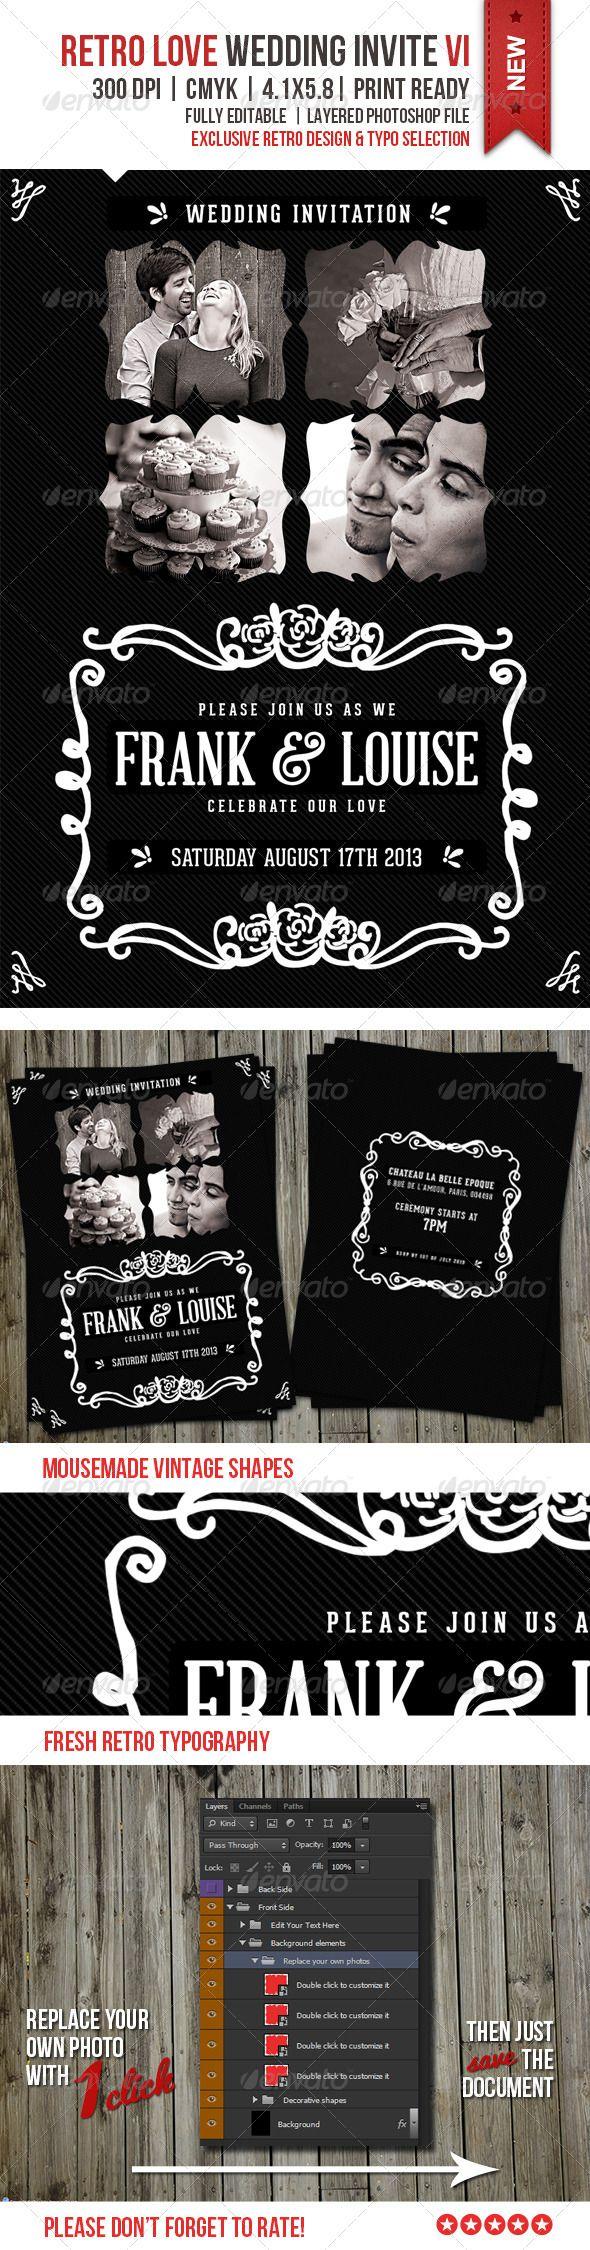 design printable invitation cards online free%0A Retro Love Wedding Invite VI  Printable Wedding InvitationsInvitation  TemplatesPrint